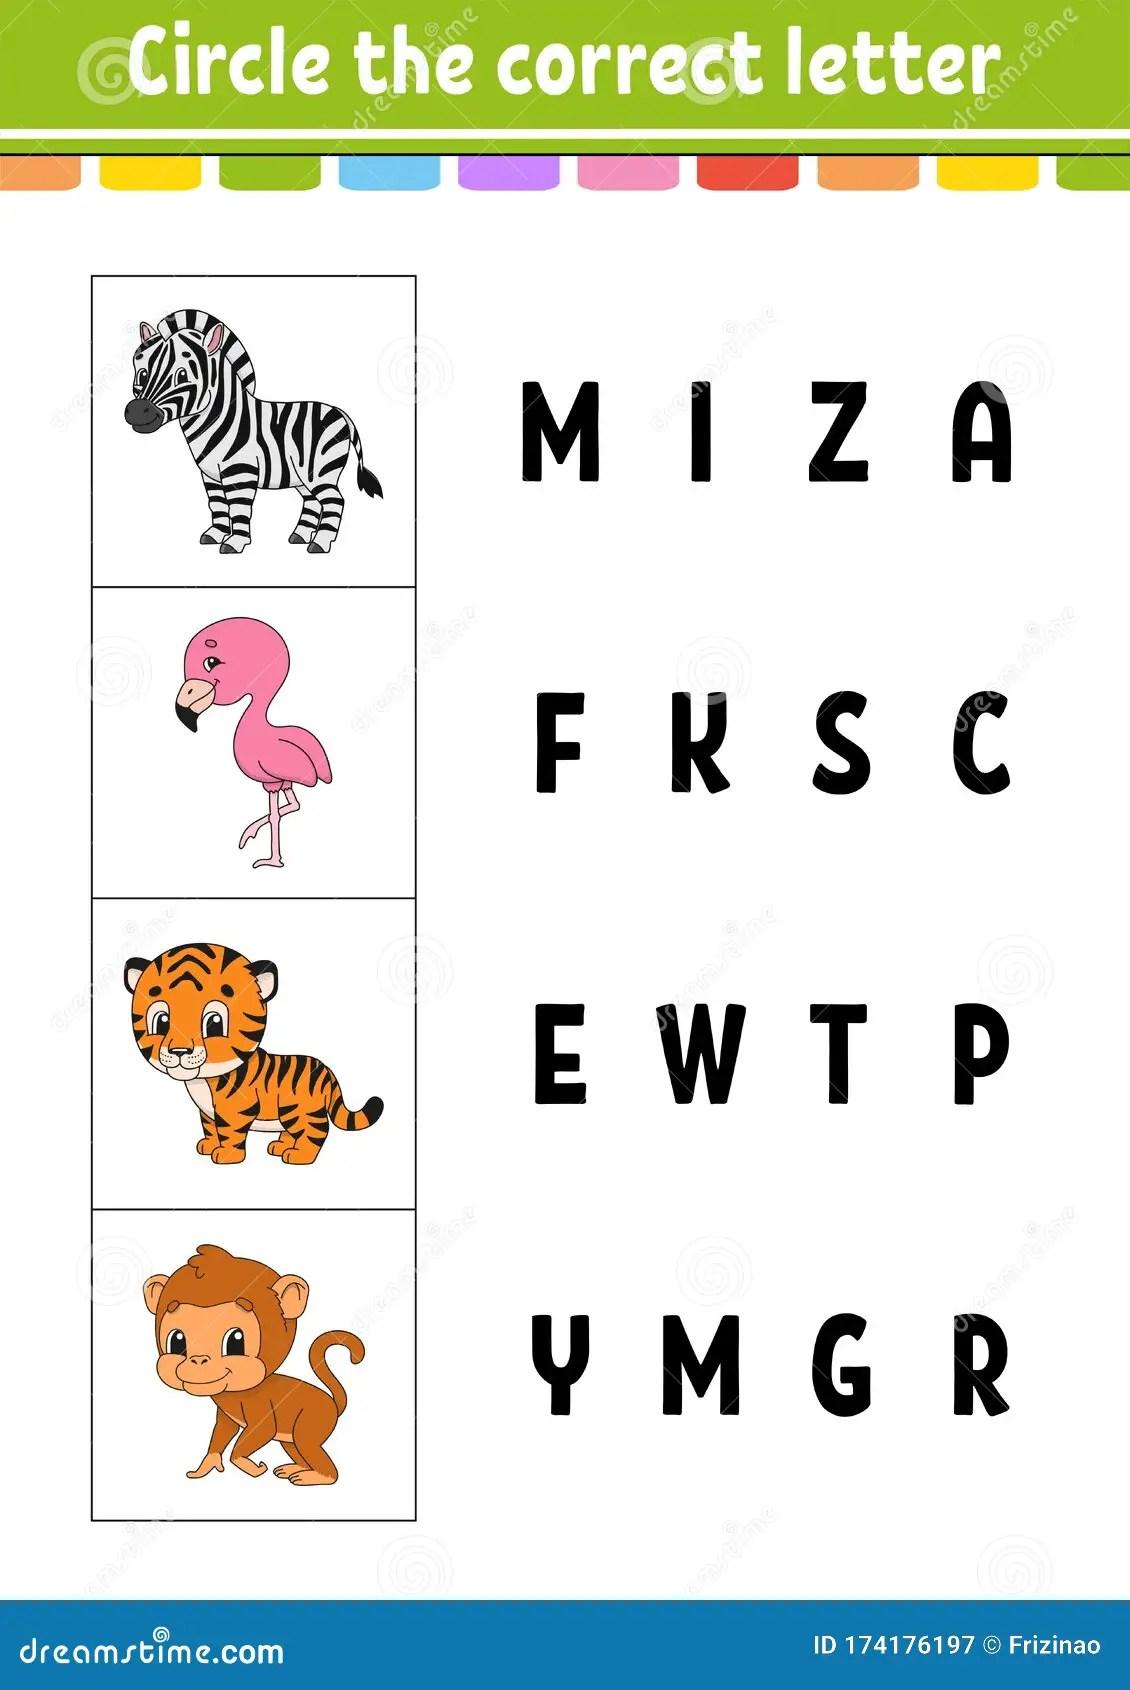 Circle The Correct Letter Zebra Flamingo Tiger Monkey